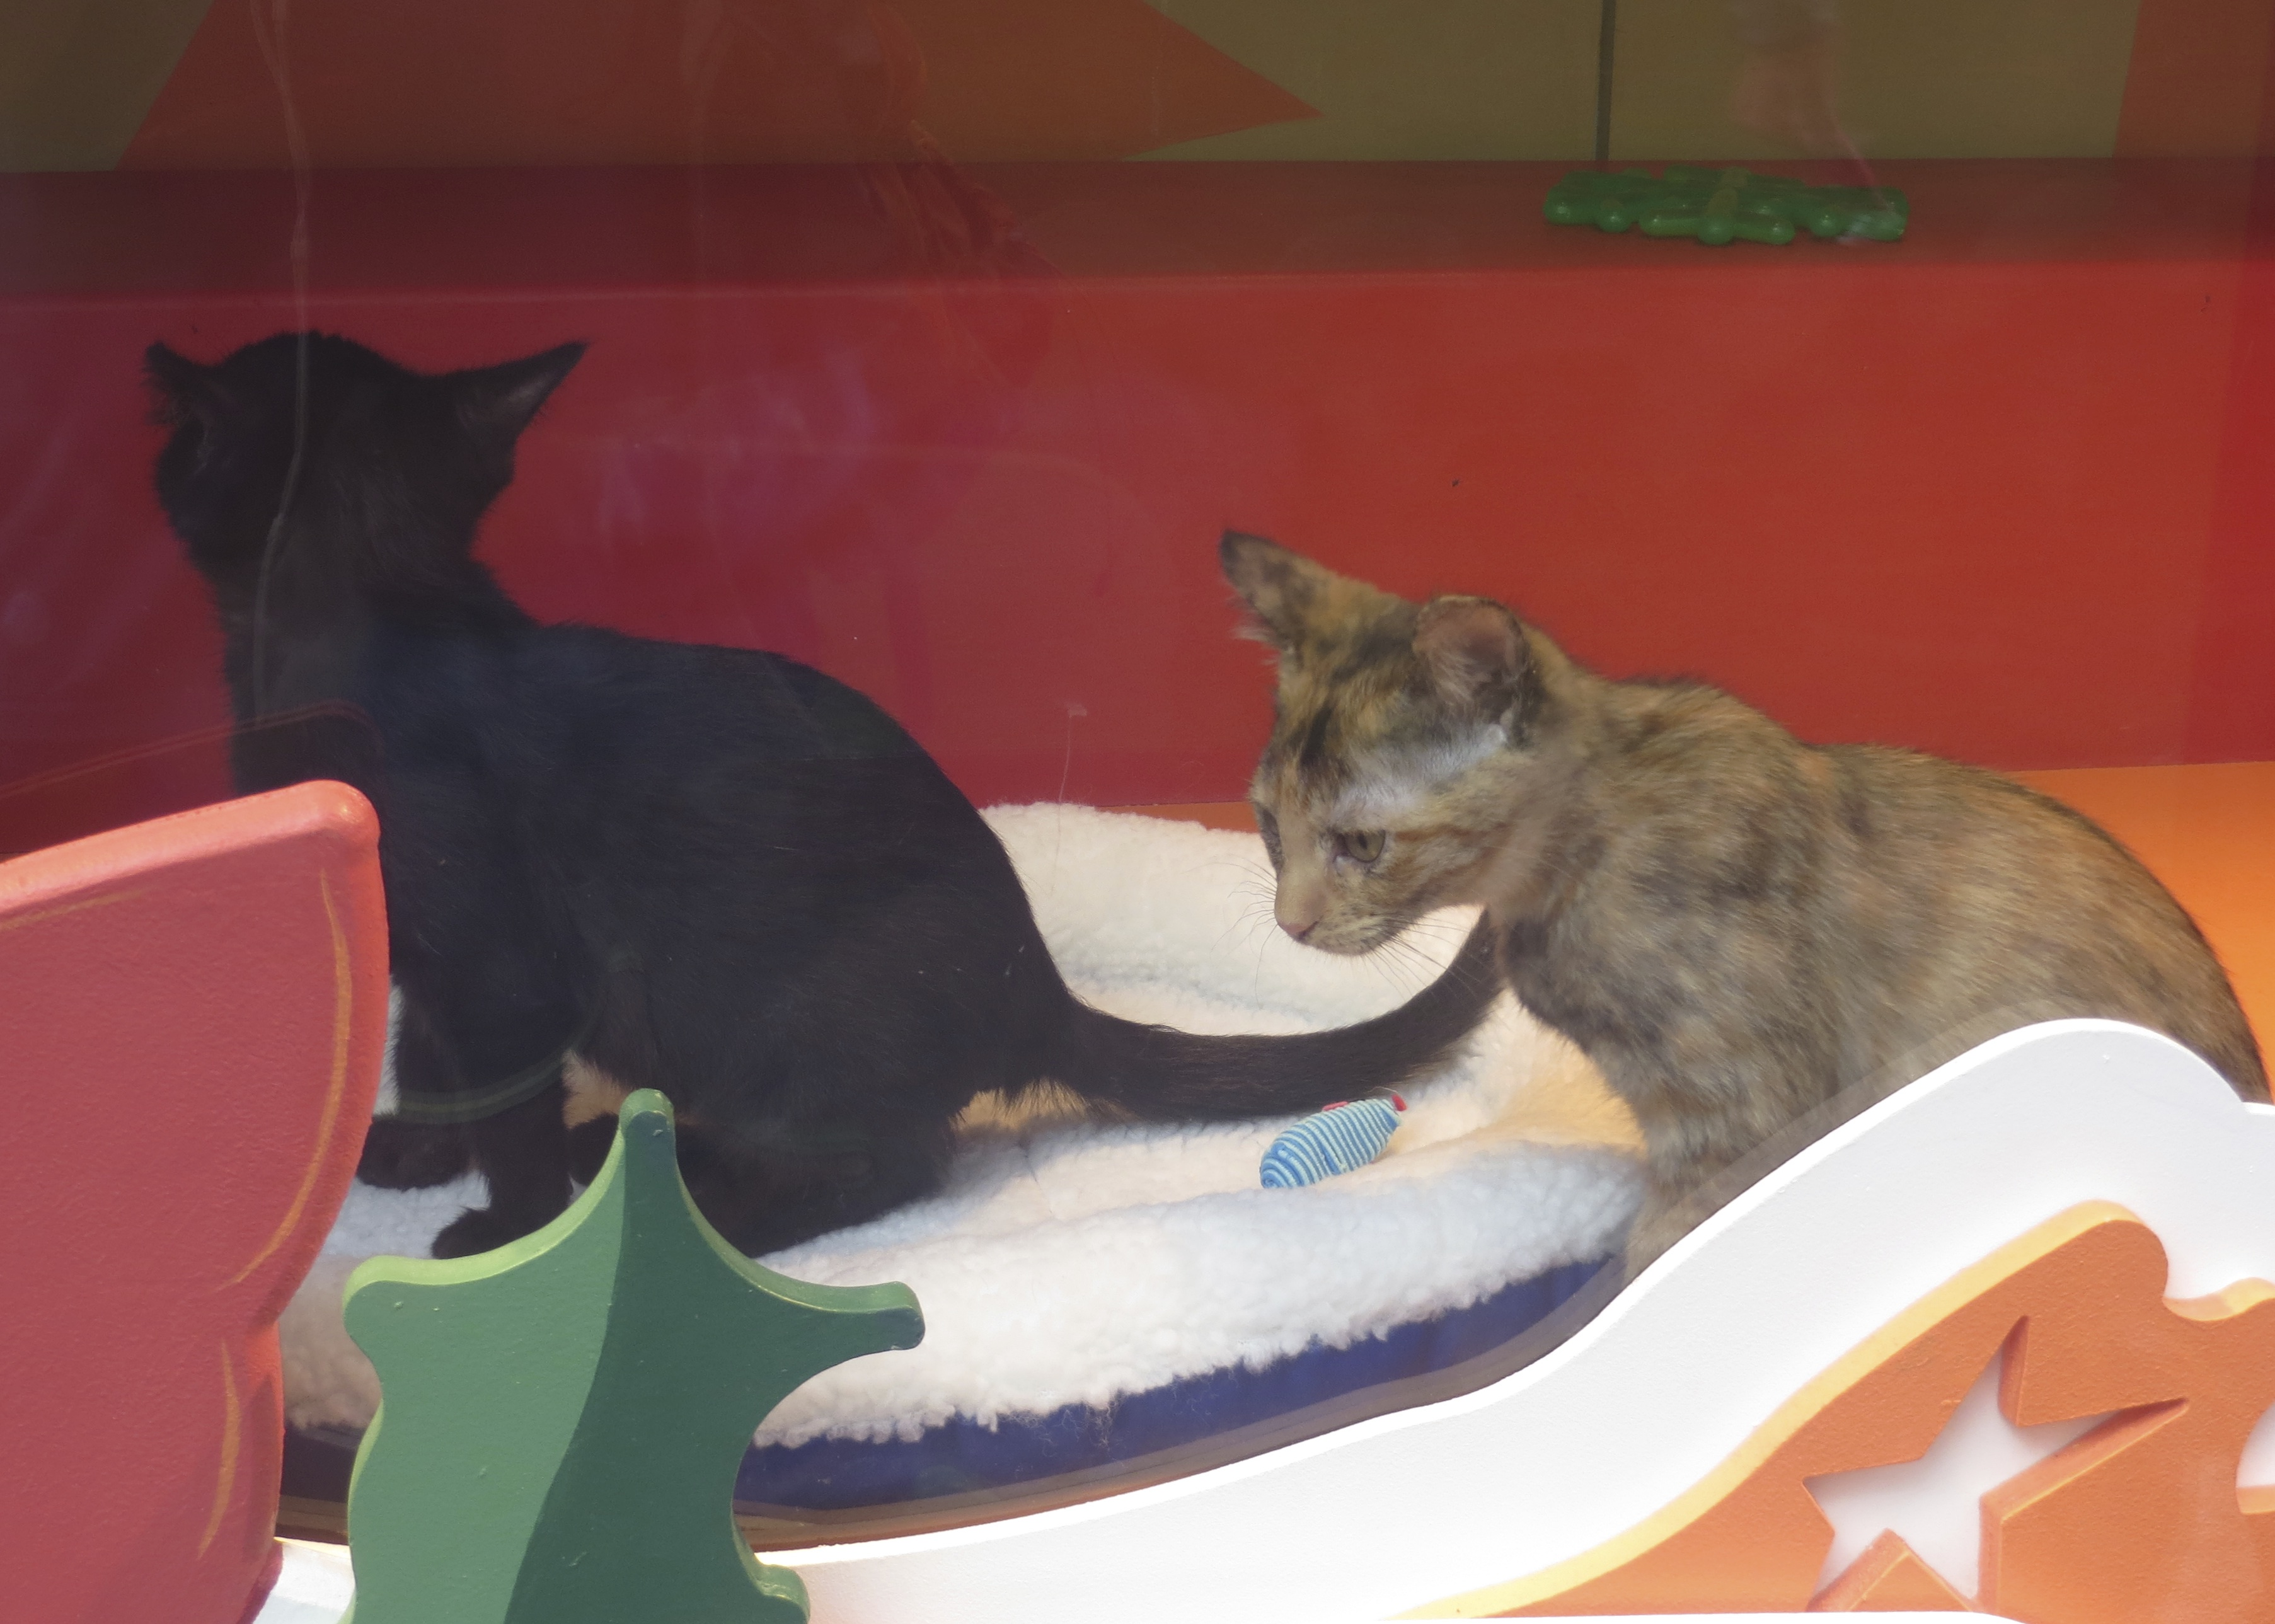 Black Kitten And Tortoiseshell Kitten